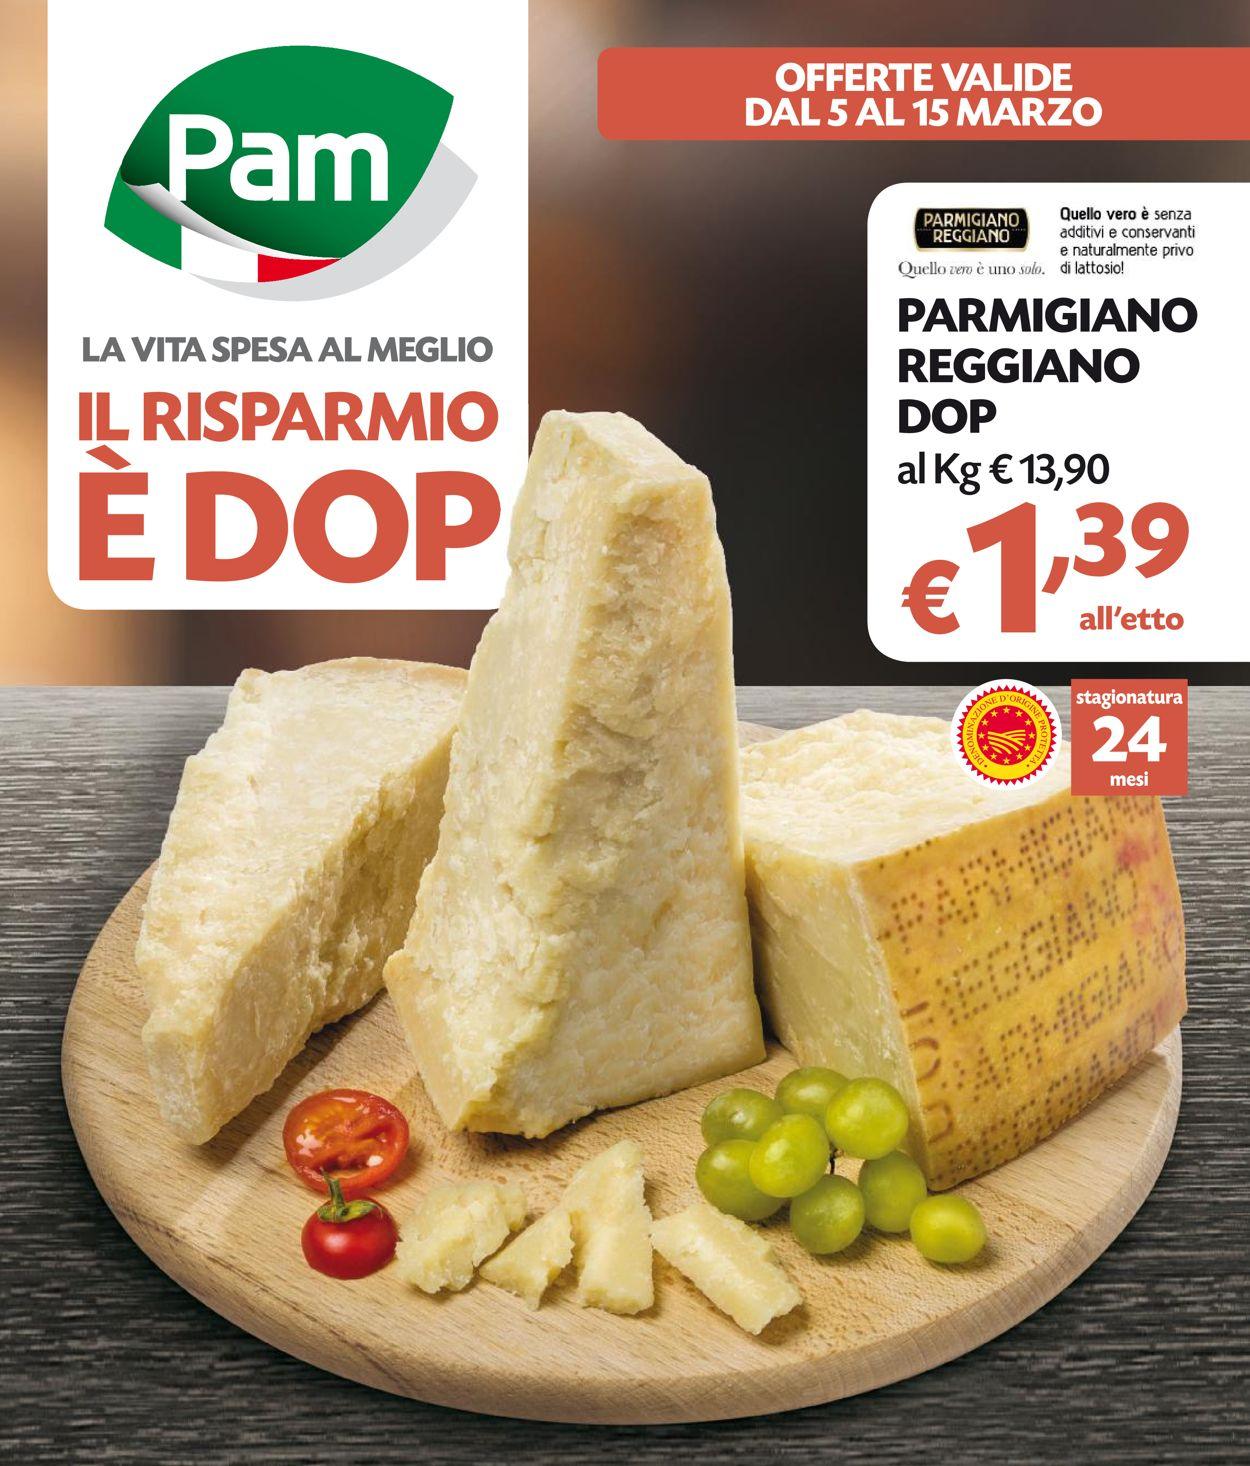 Volantino Pam Panorama - Offerte 05/03-15/03/2020